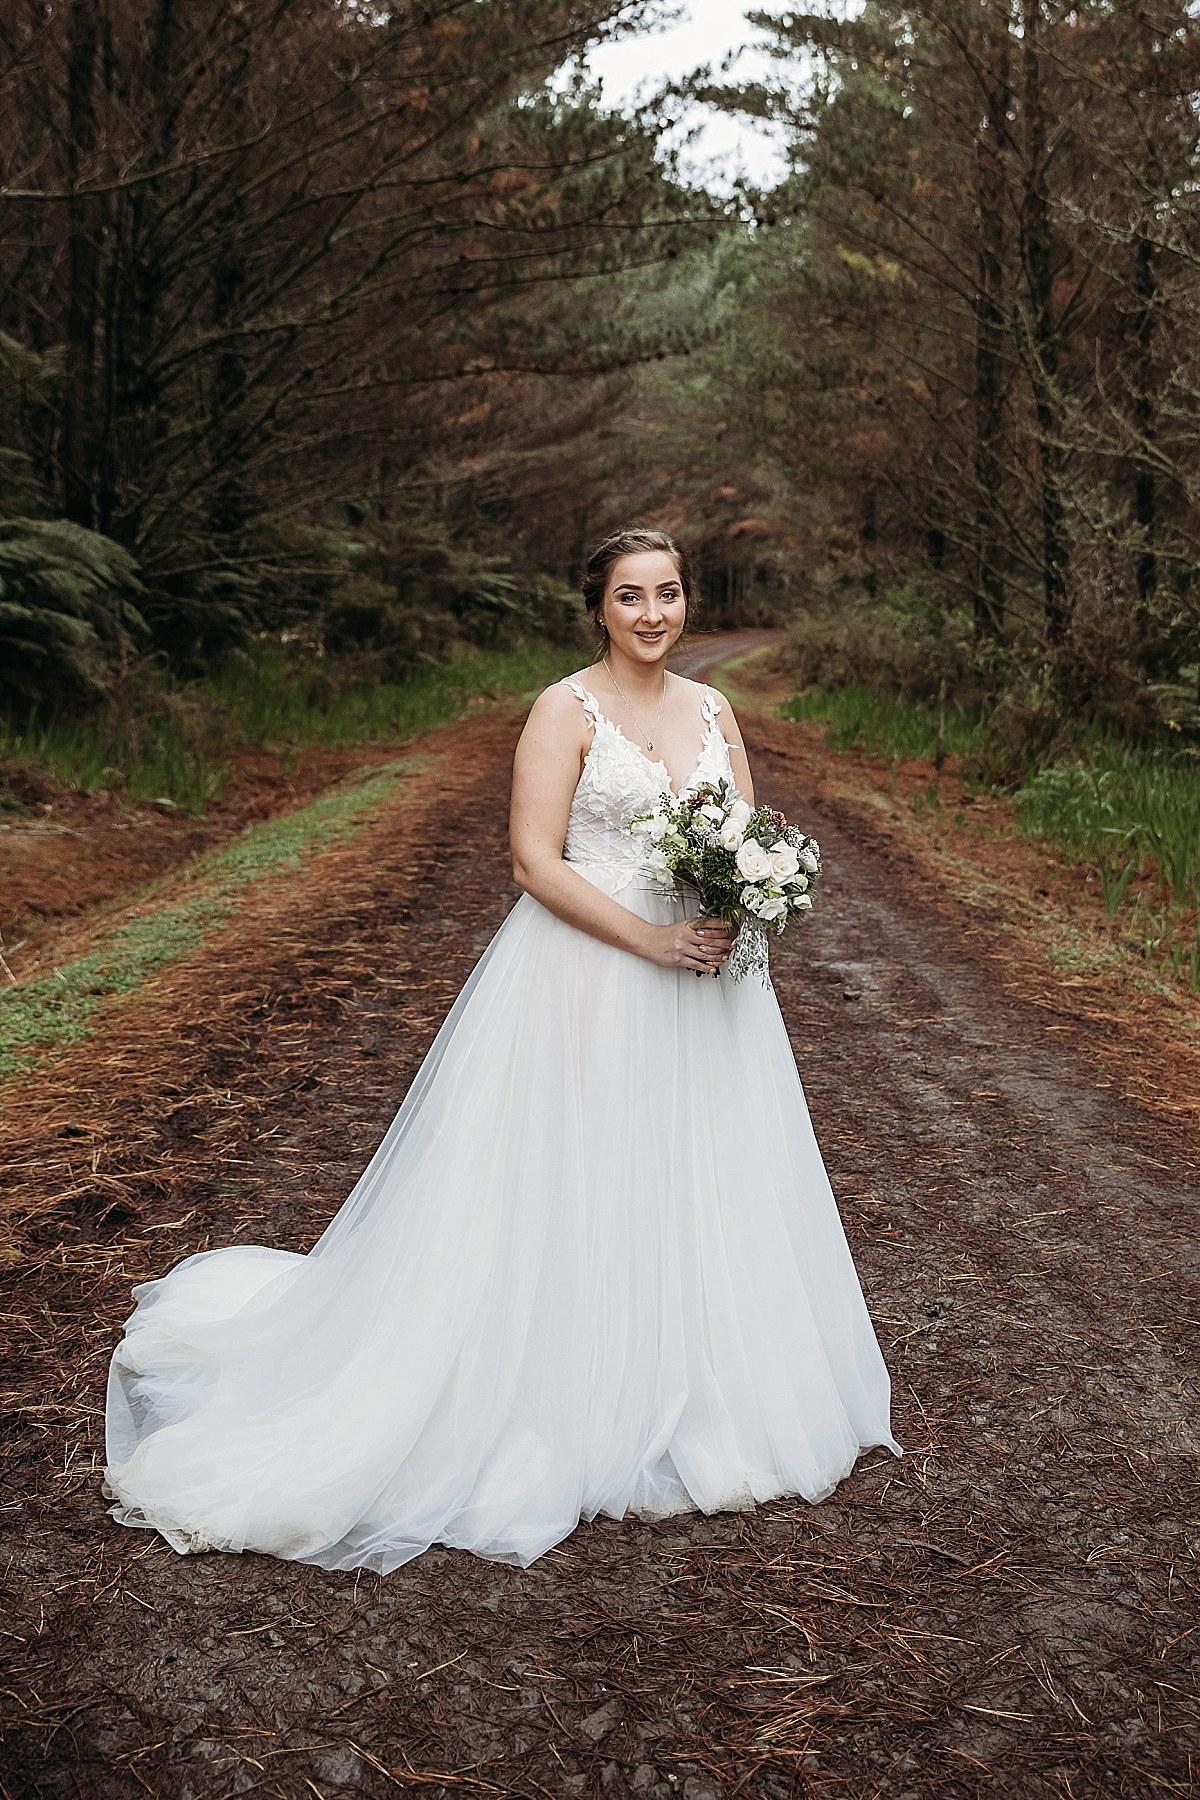 Queenstown Wedding Couple - Auckland Wedding Photographer_0114.jpg